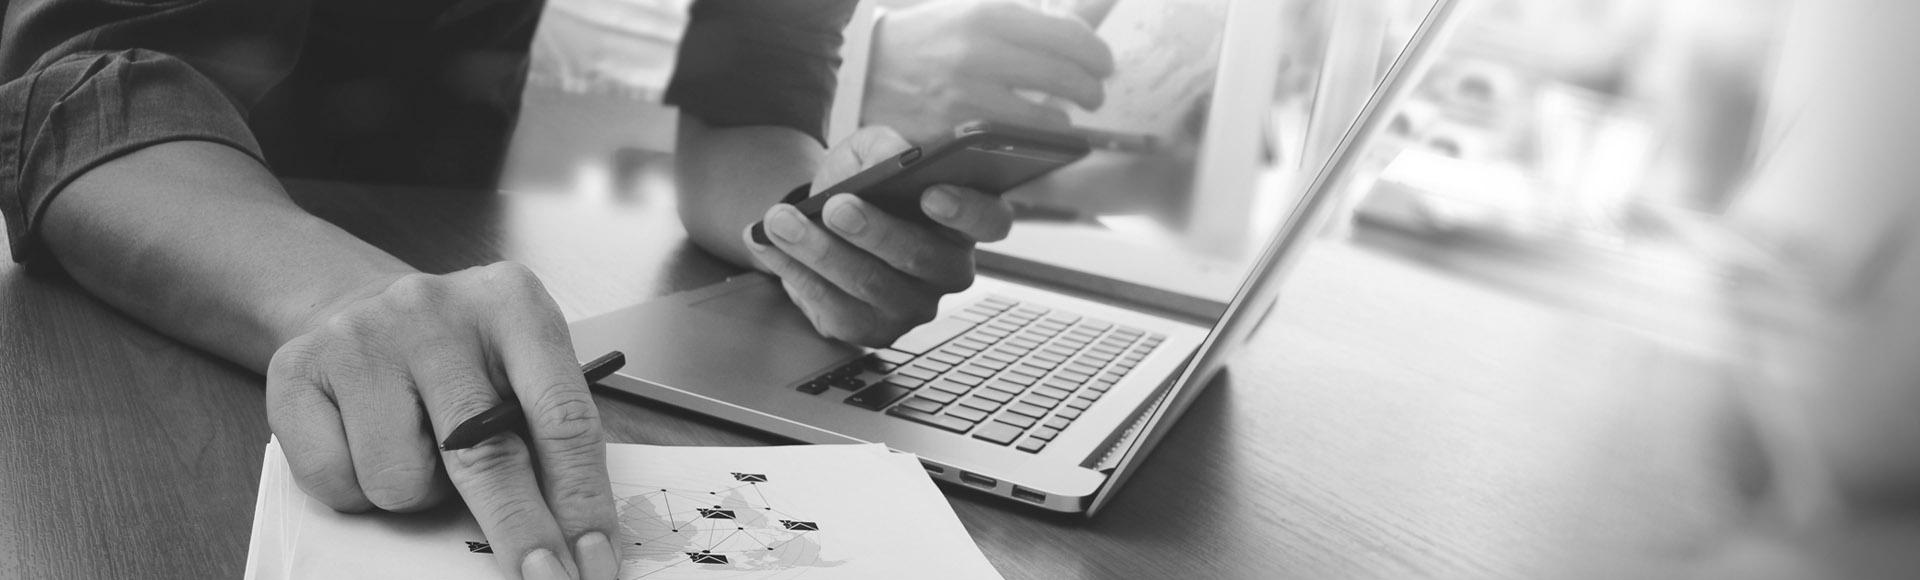 Social Media Listening, Engagement and Reporting with Nexa, Dubai